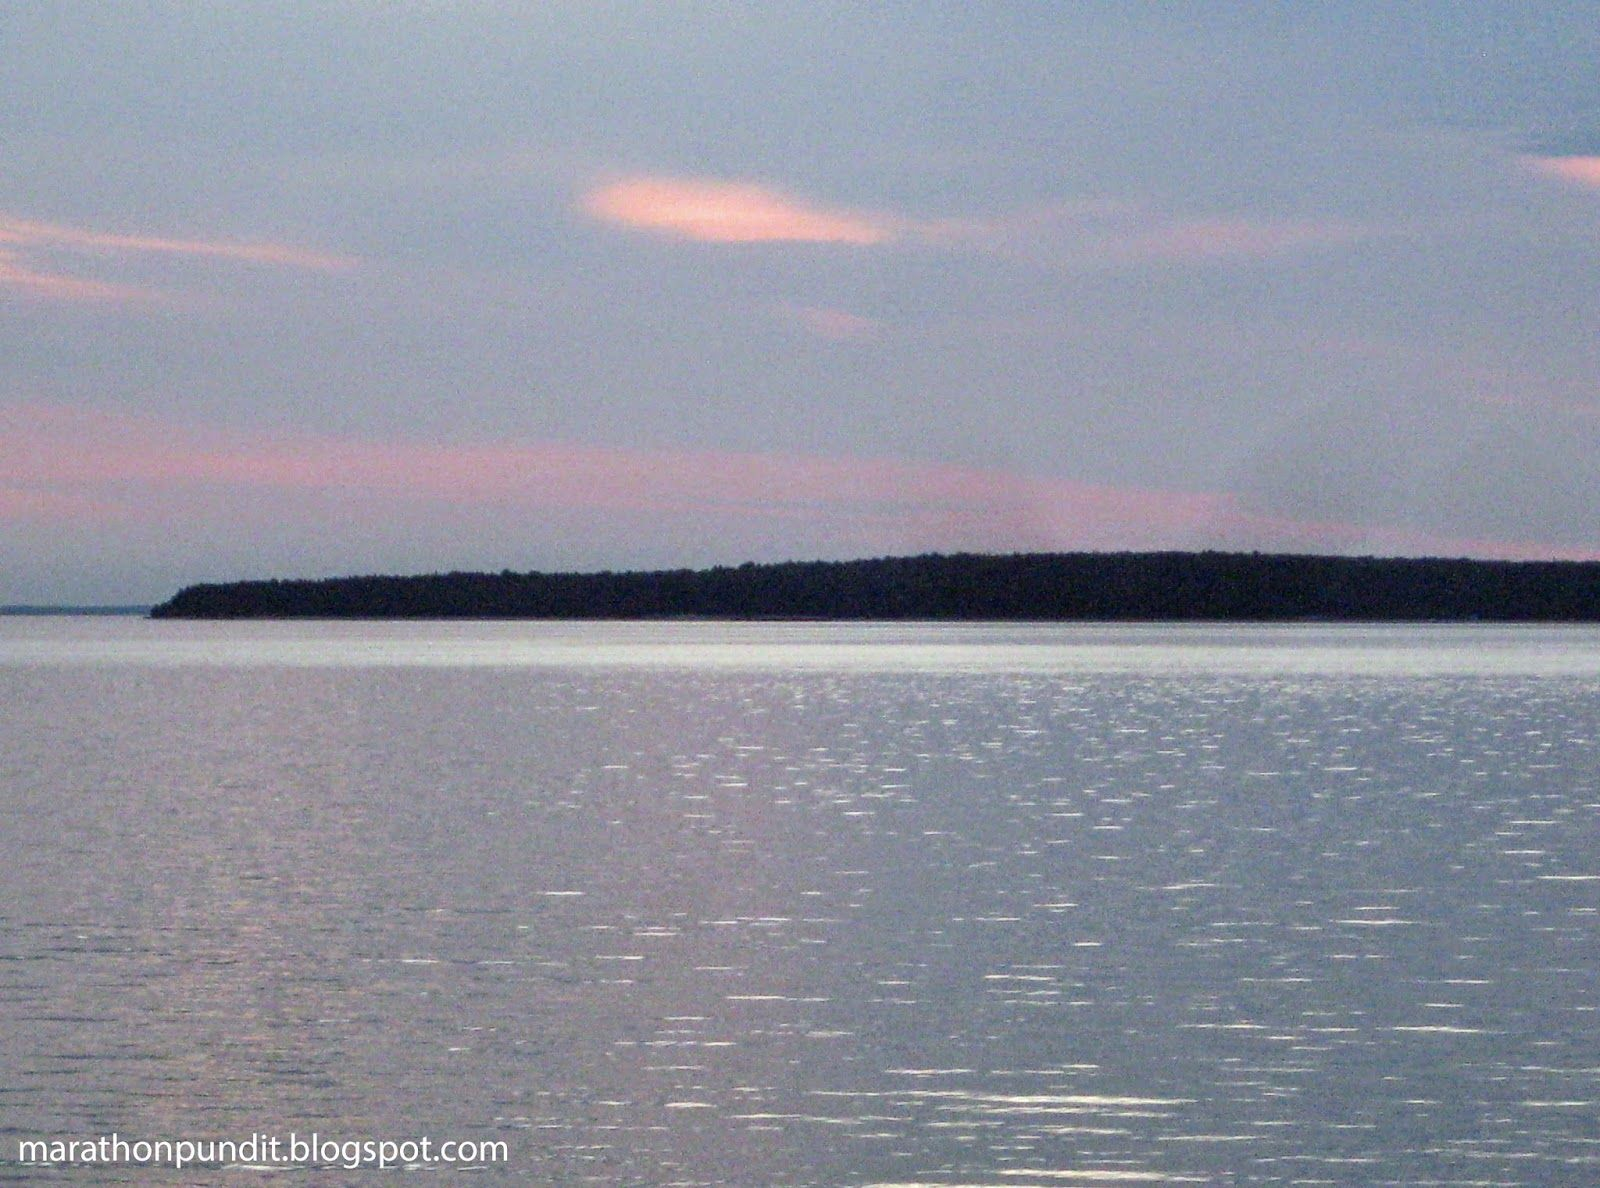 Lake Huron at St. Ignace, Michigan